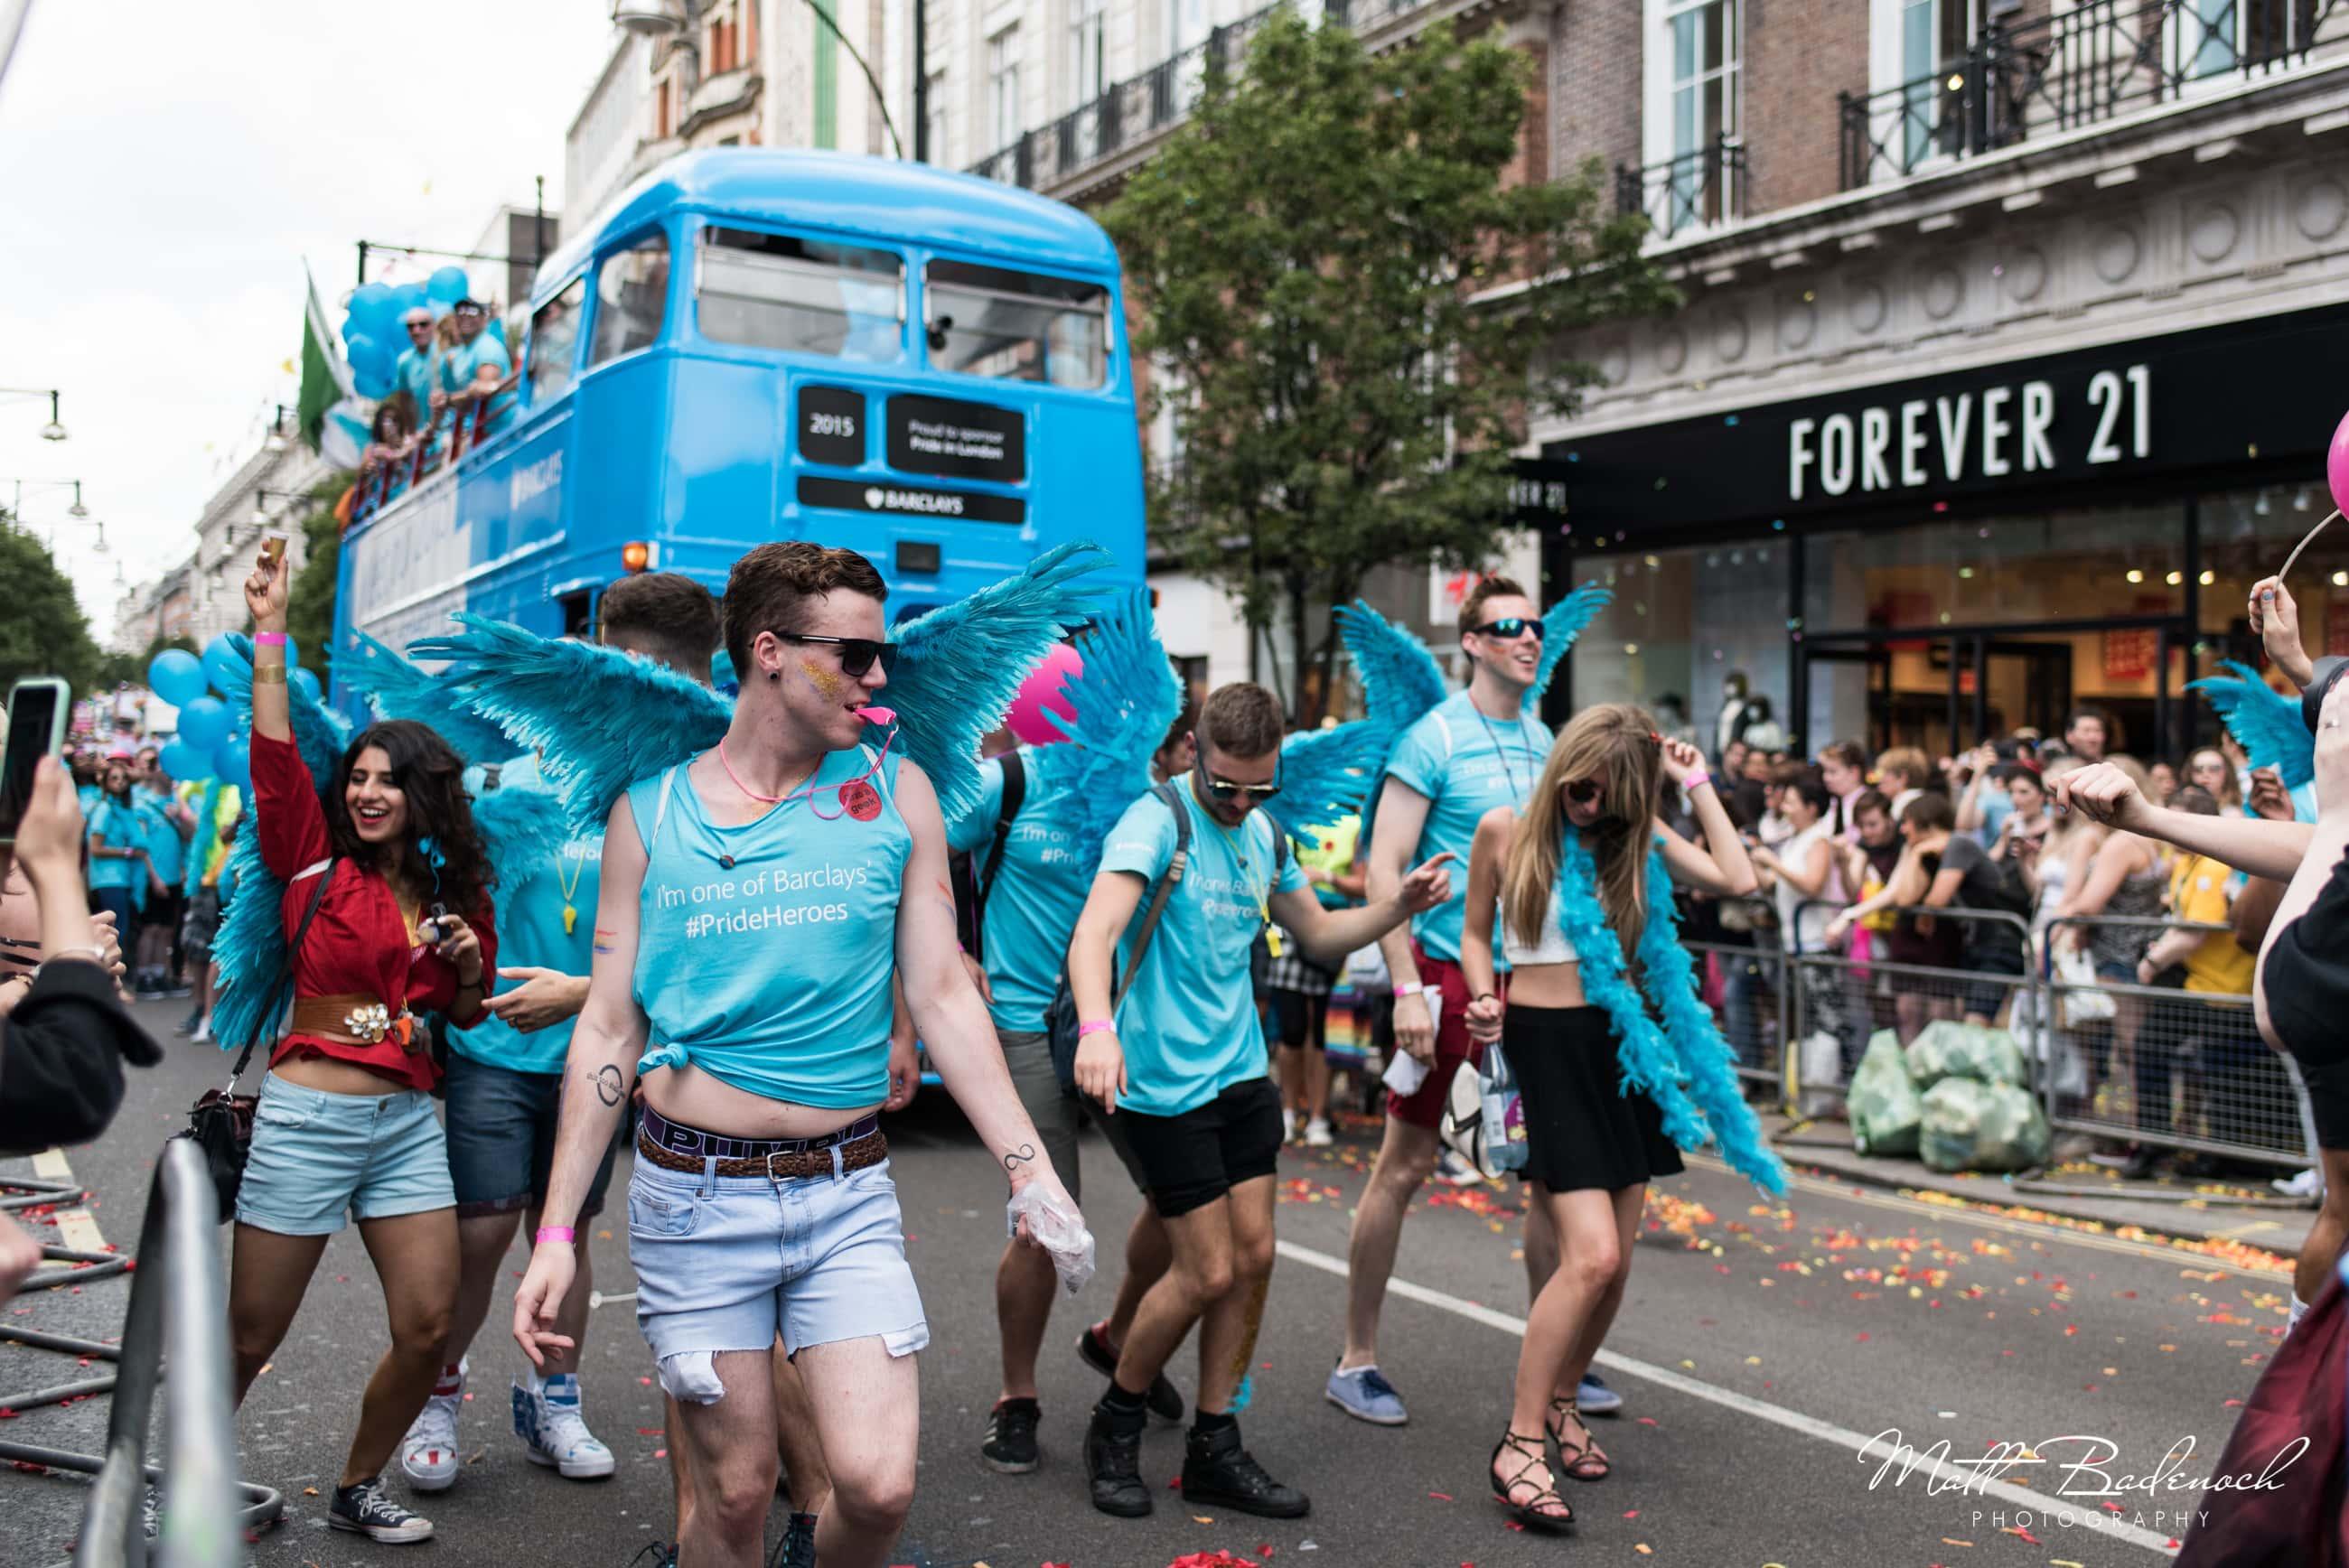 Barclays Pride Hereos, London Pride Parade 2015 photos